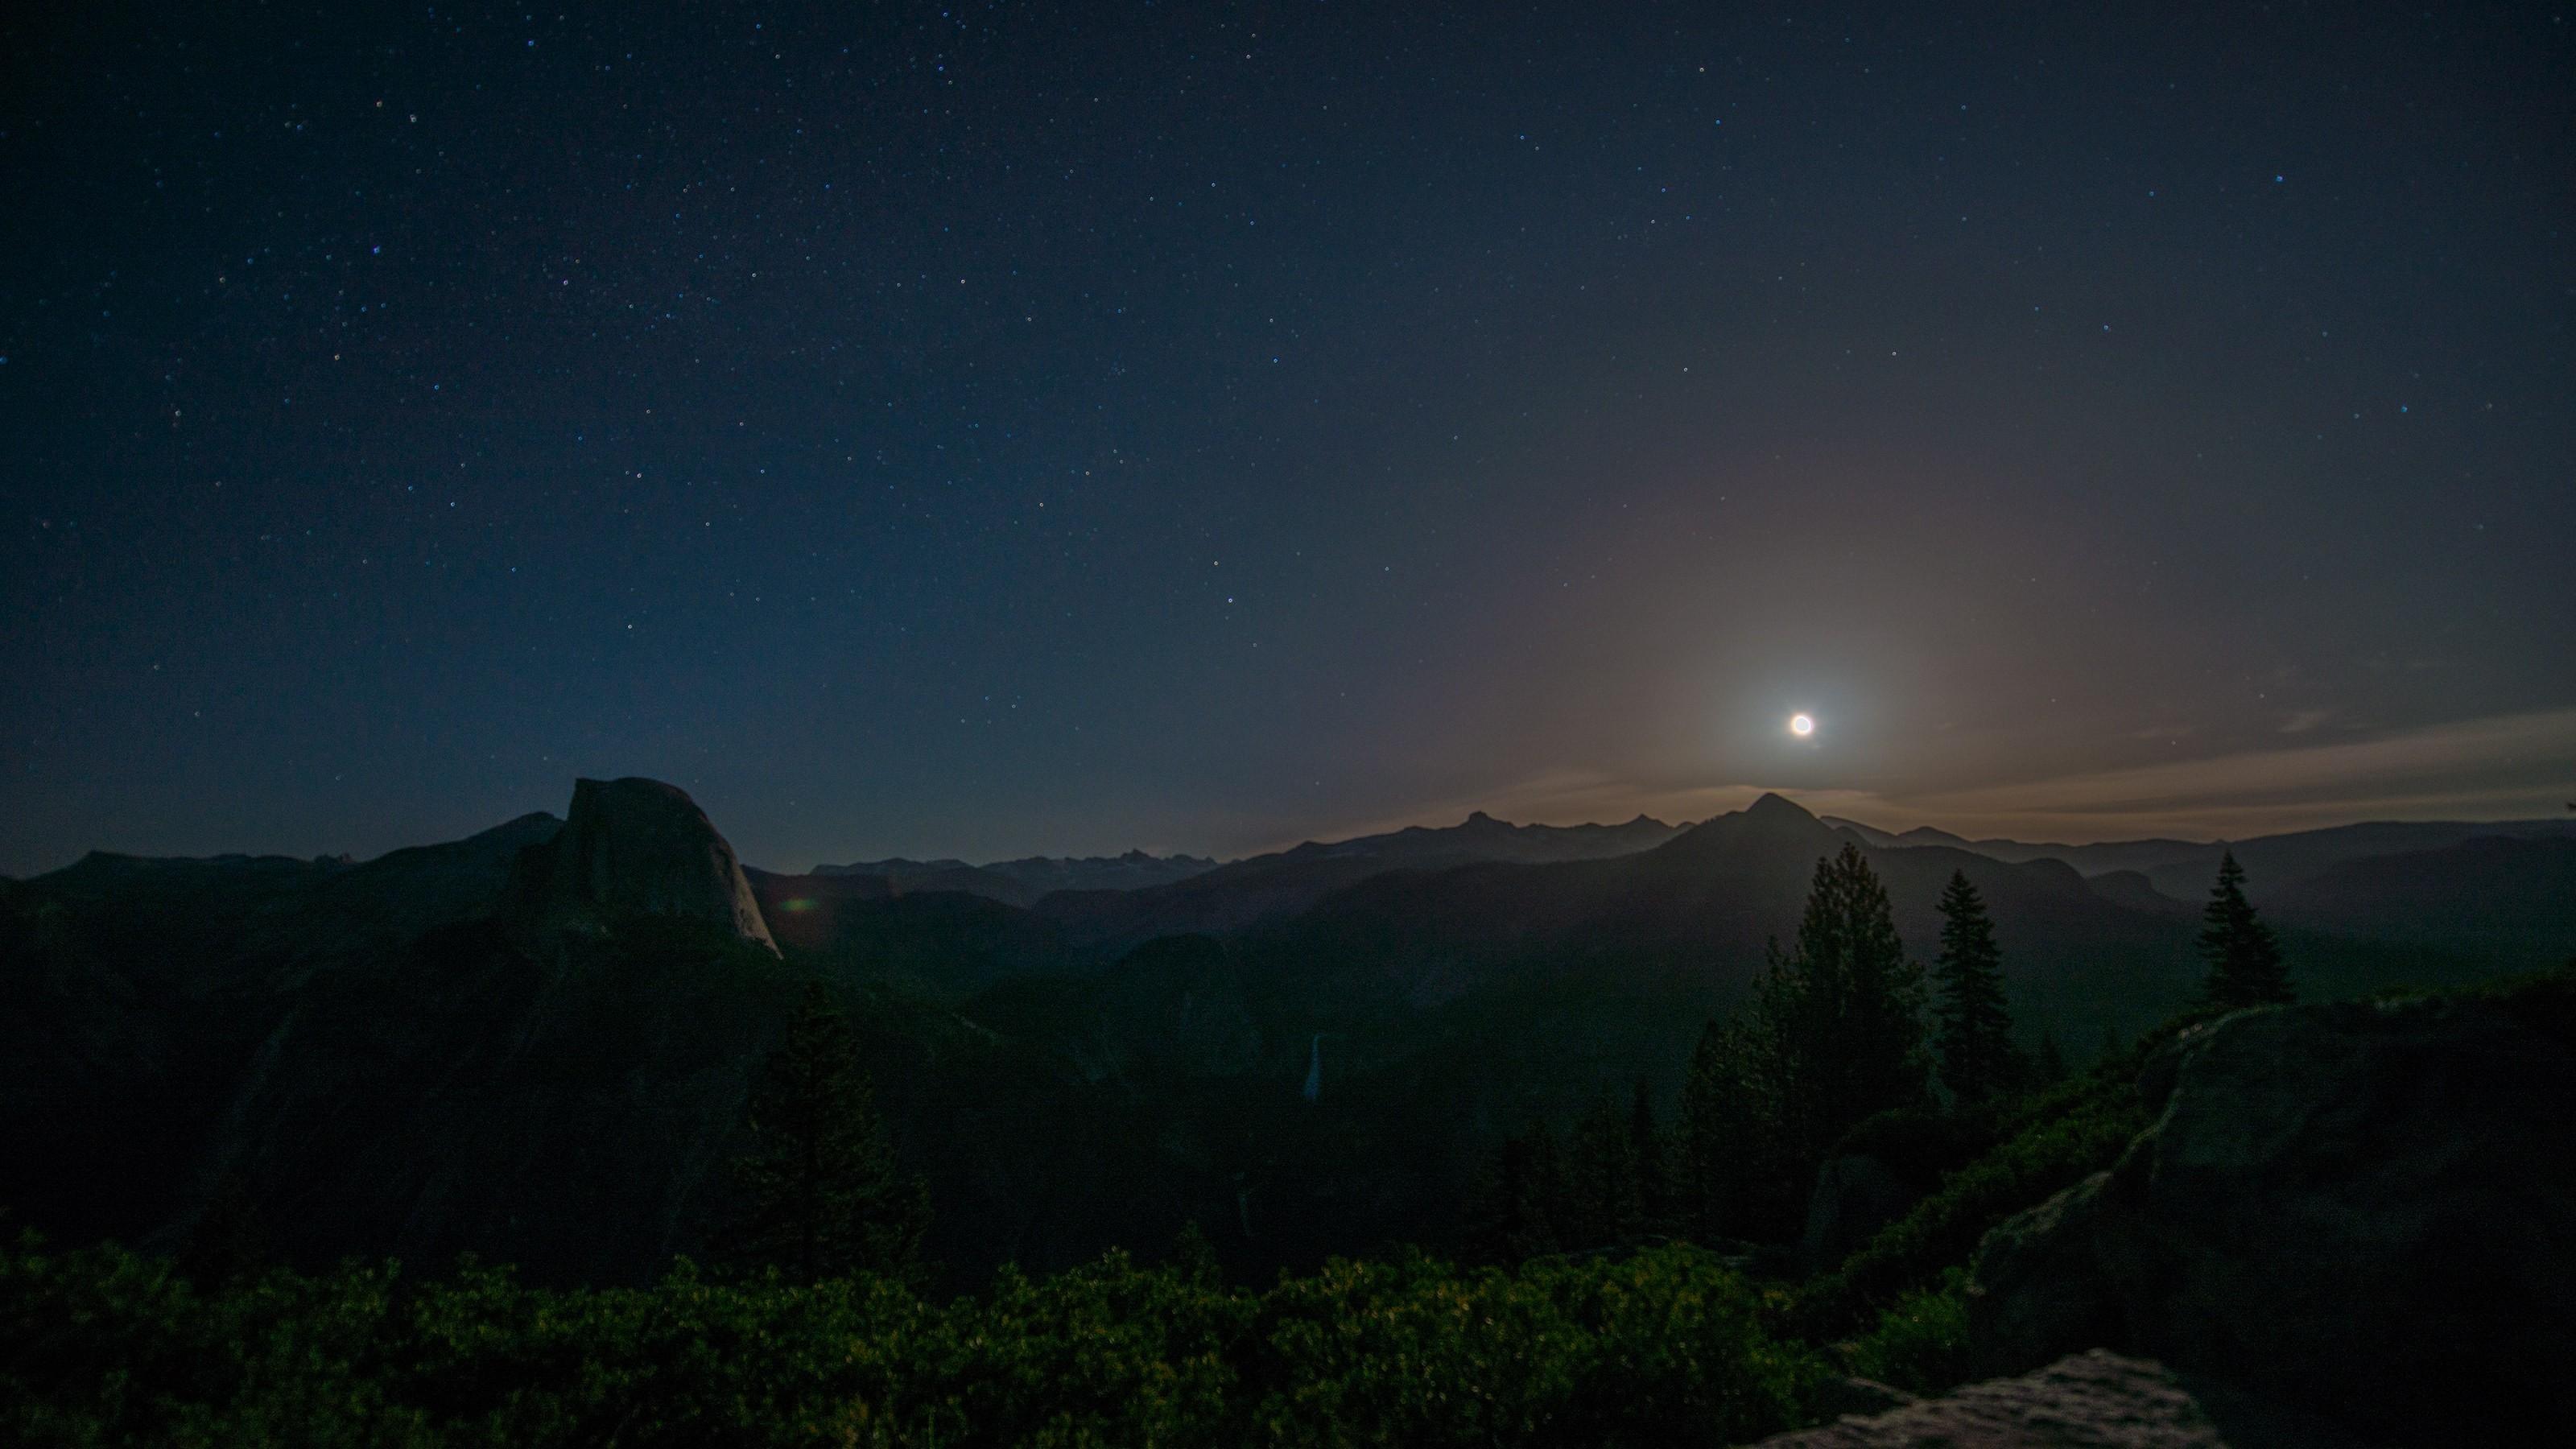 #nature, #forest, #Moon, #Yosemite Valley, #Yosemite .